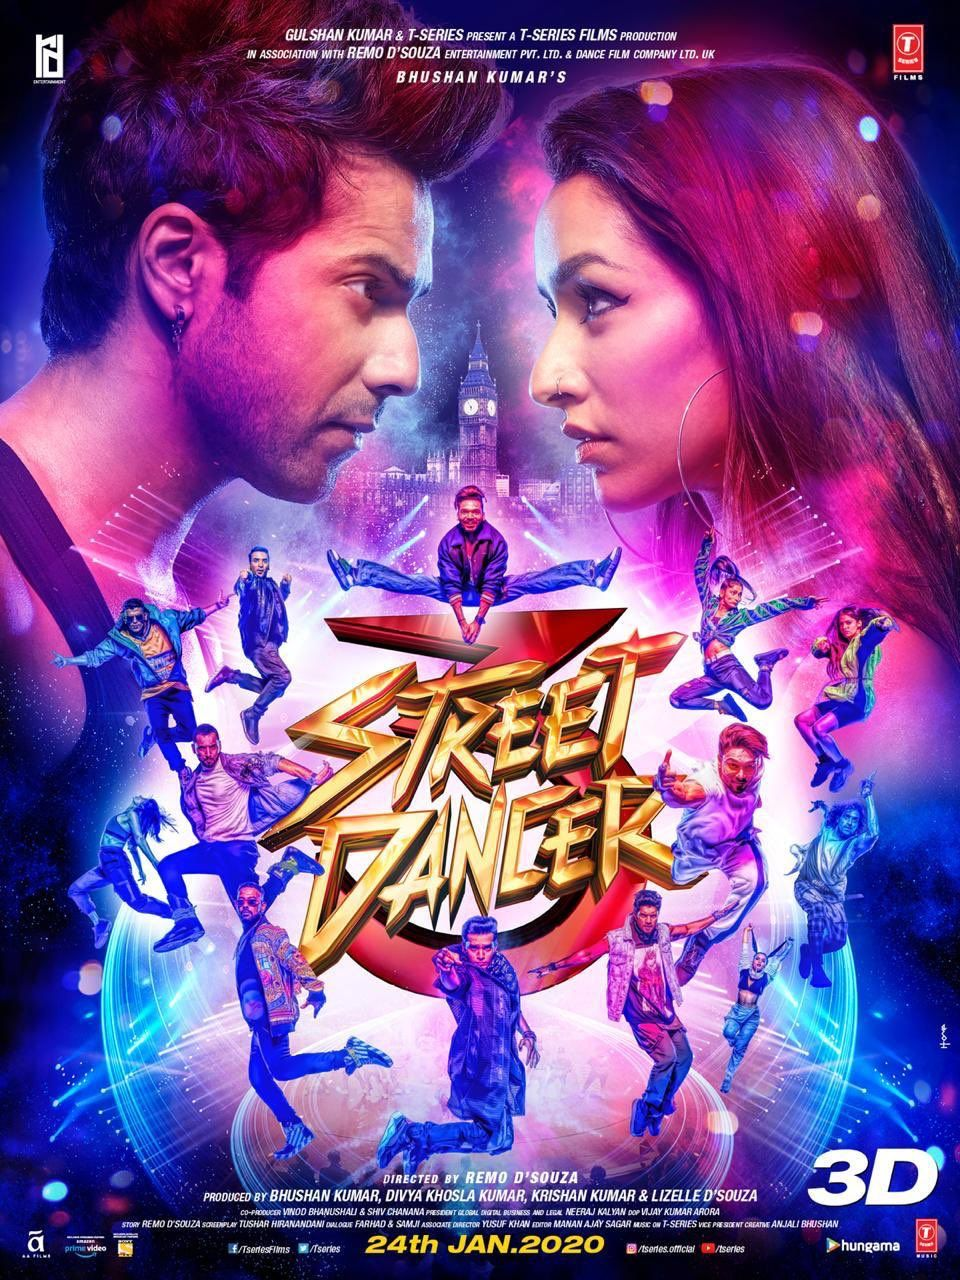 Street Dancer 3d Trailer Varun Dhawan And Shraddha Kapoor Brings India Pak Rivalry From Cricket To Dance Floor Upcoming Movies 2020 Full Movies Download Hindi Movies